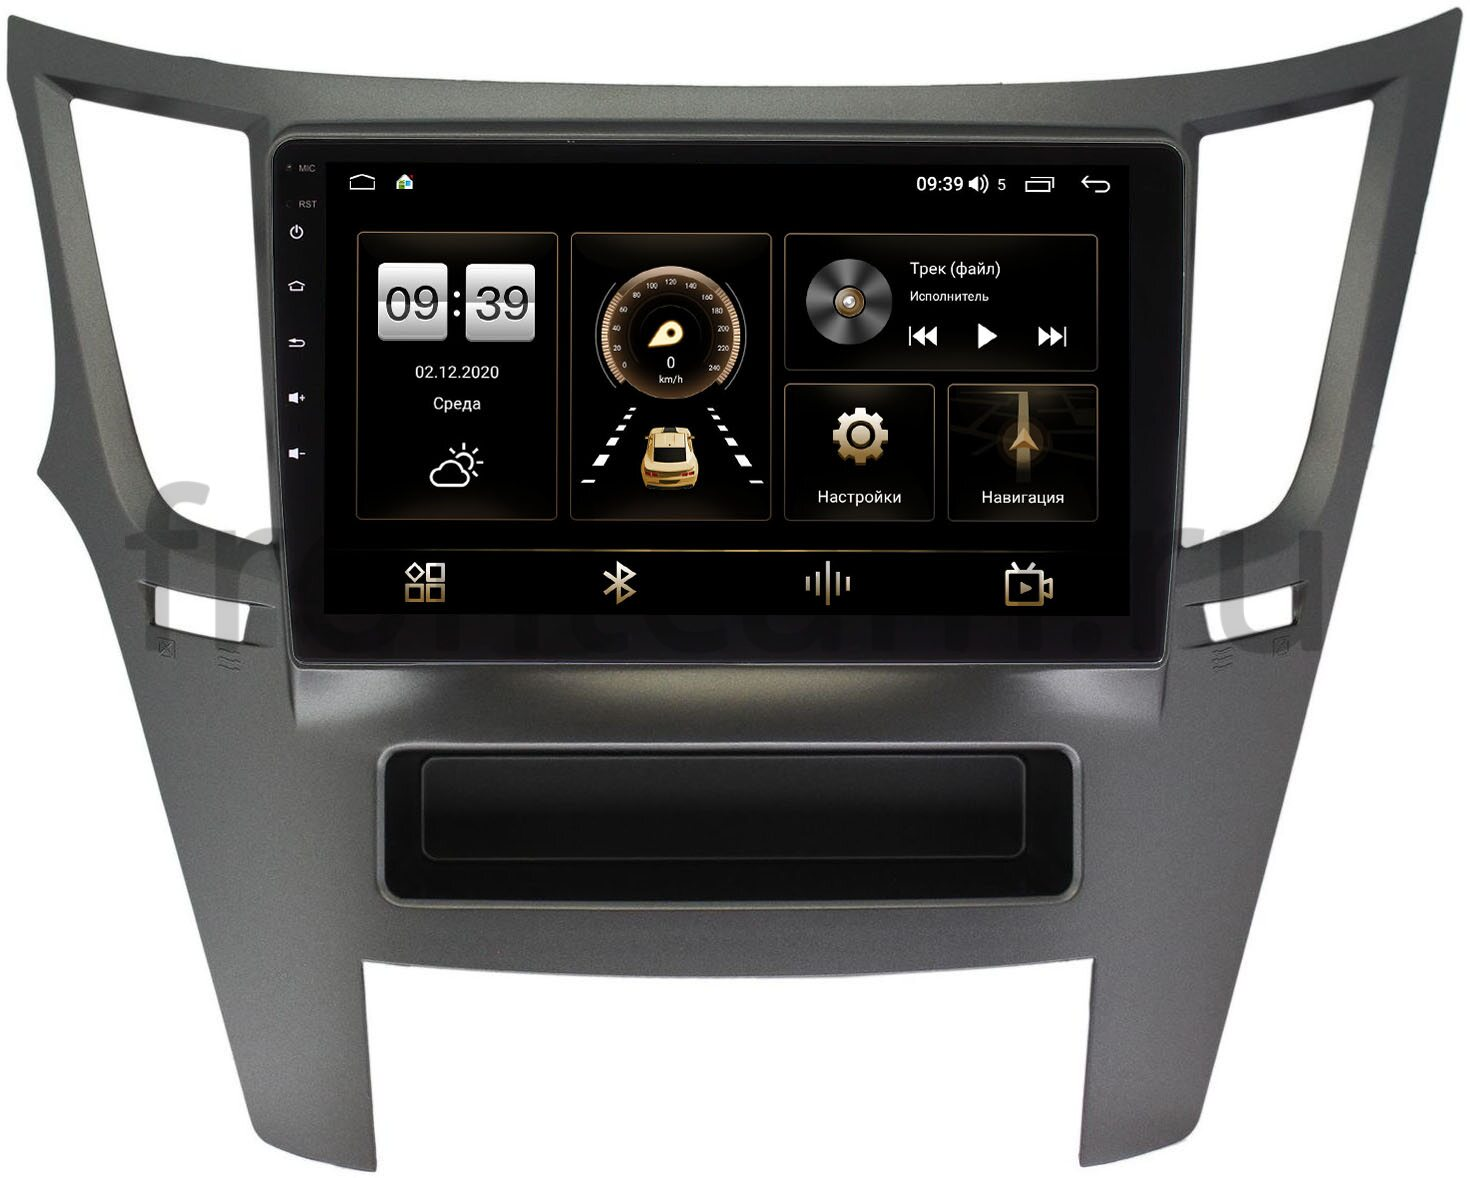 Штатная магнитола Subaru Legacy V 2009-2014, Outback IV 2009-2014 LeTrun 3792-9051 на Android 10 (4/64, DSP, QLed) С оптическим выходом (+ Камера заднего вида в подарок!)